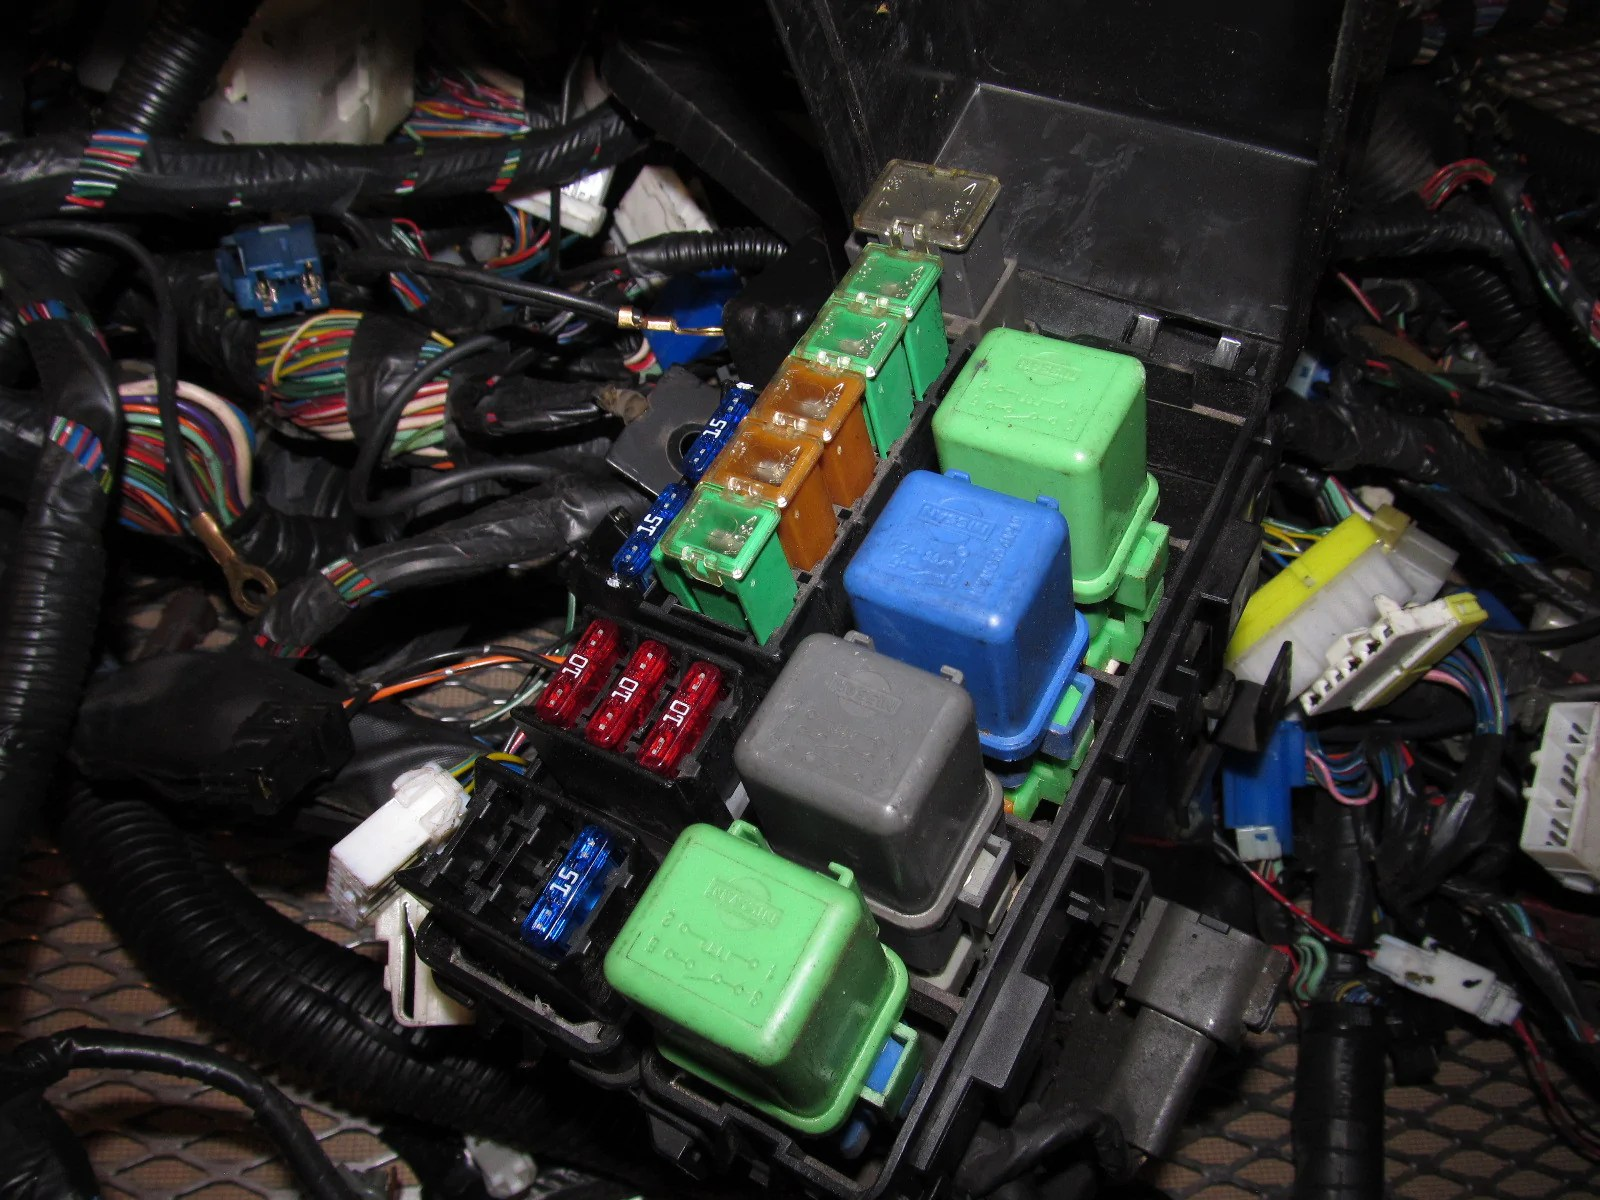 medium resolution of nissan 97 240sx fuse box wiring diagram technic 1996 nissan 240sx fuse box